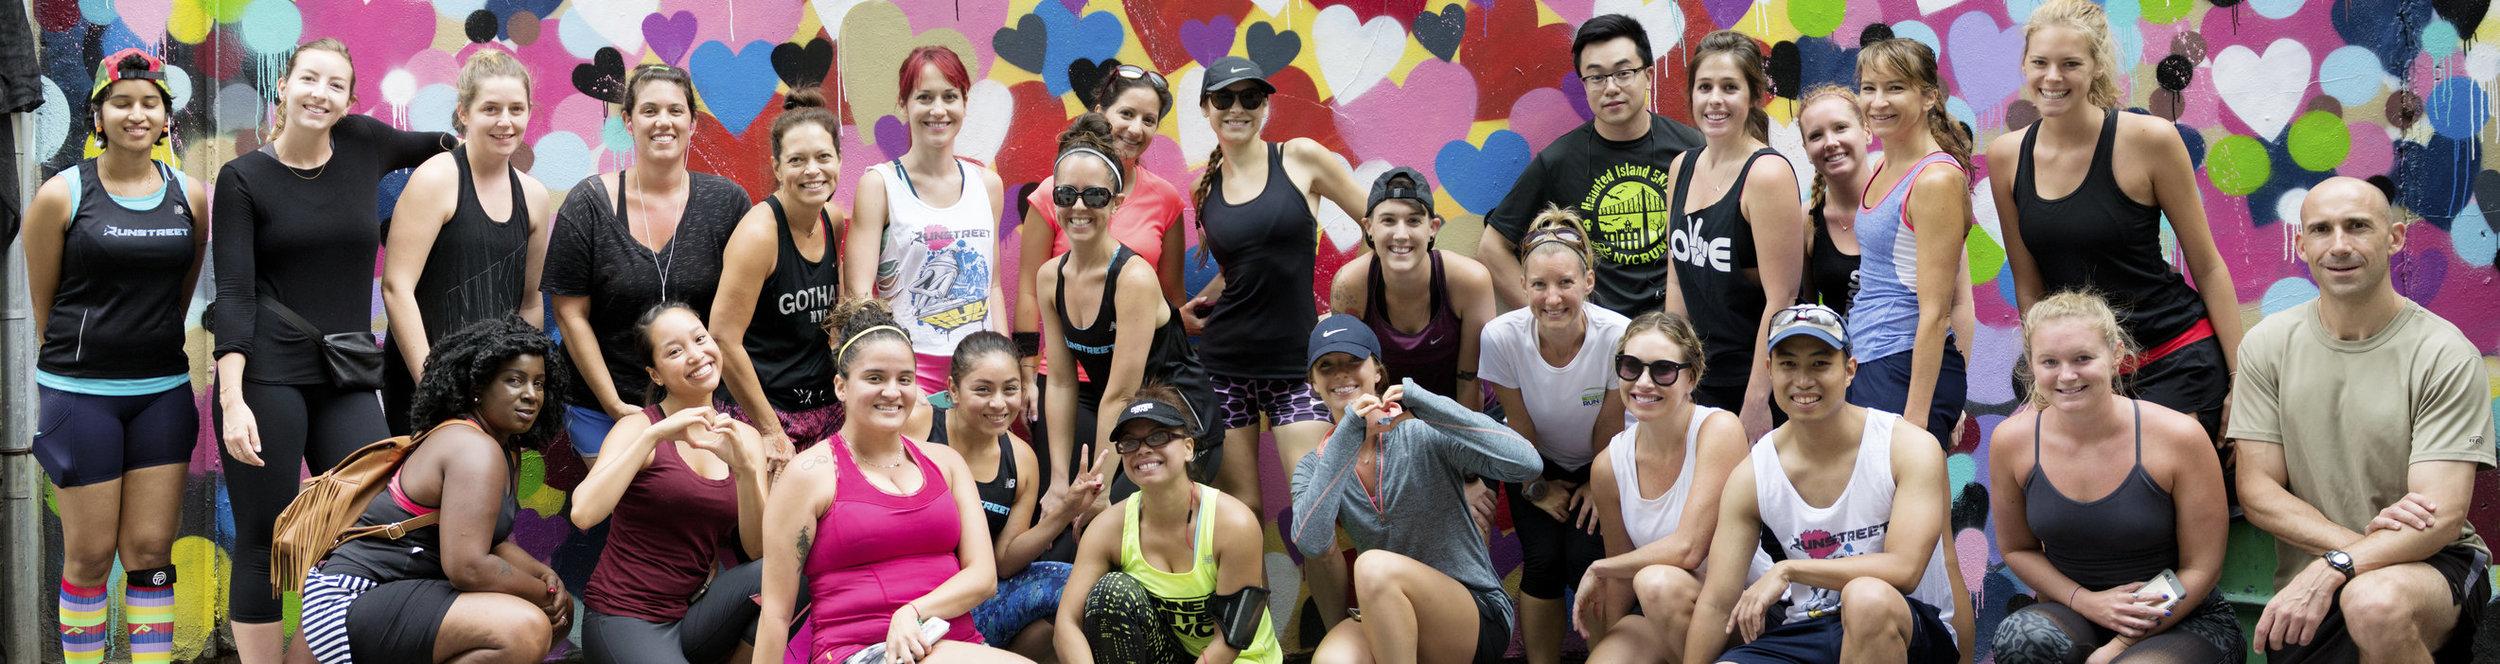 Runstreet-nyc-runners-street-art-hearts-east-village